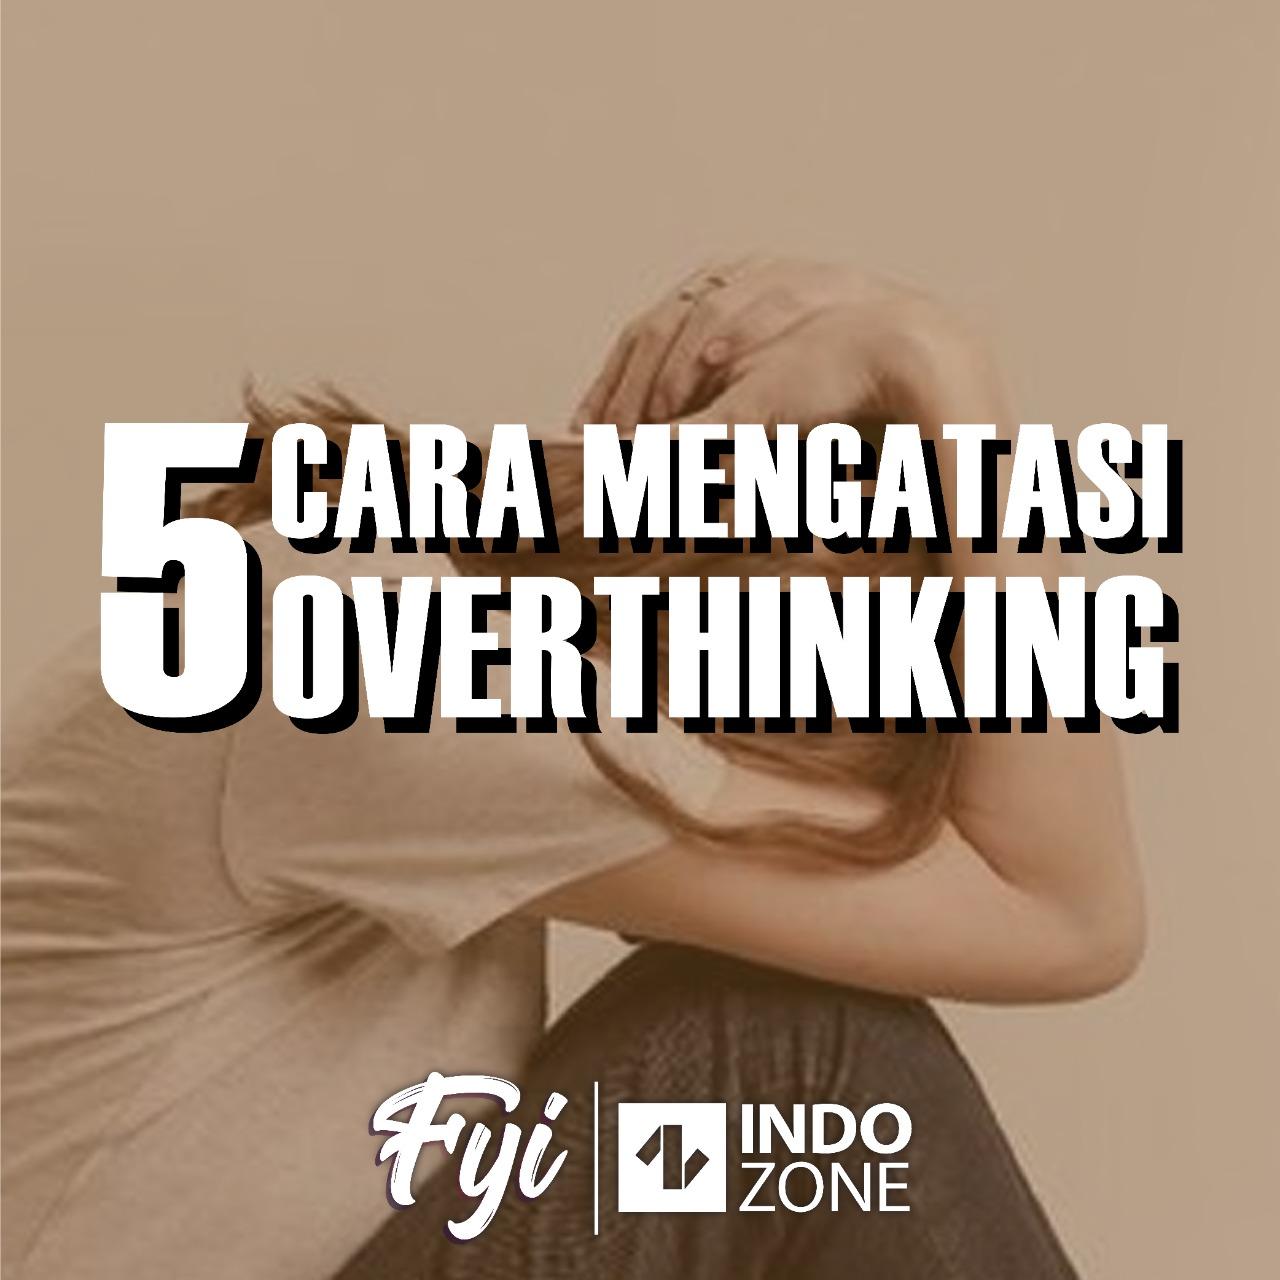 5 Cara Mengatasi Overthinking